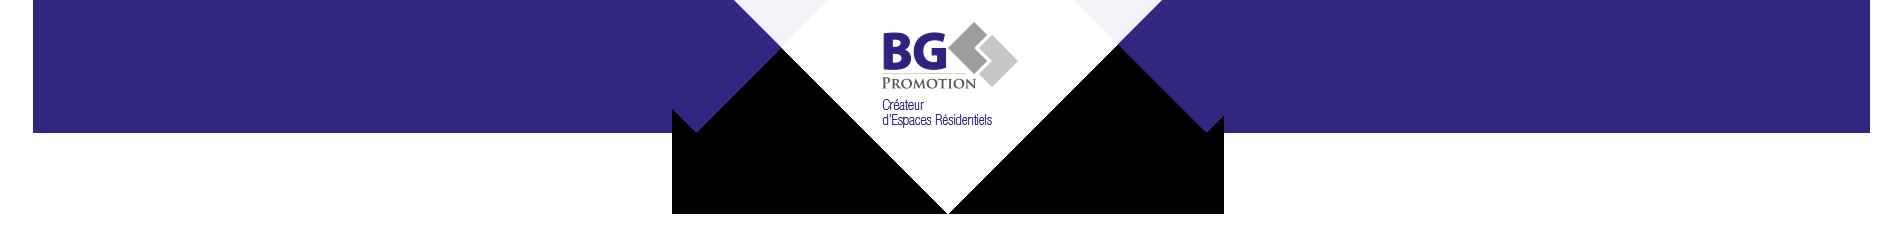 BG Promotion - Visuel footer